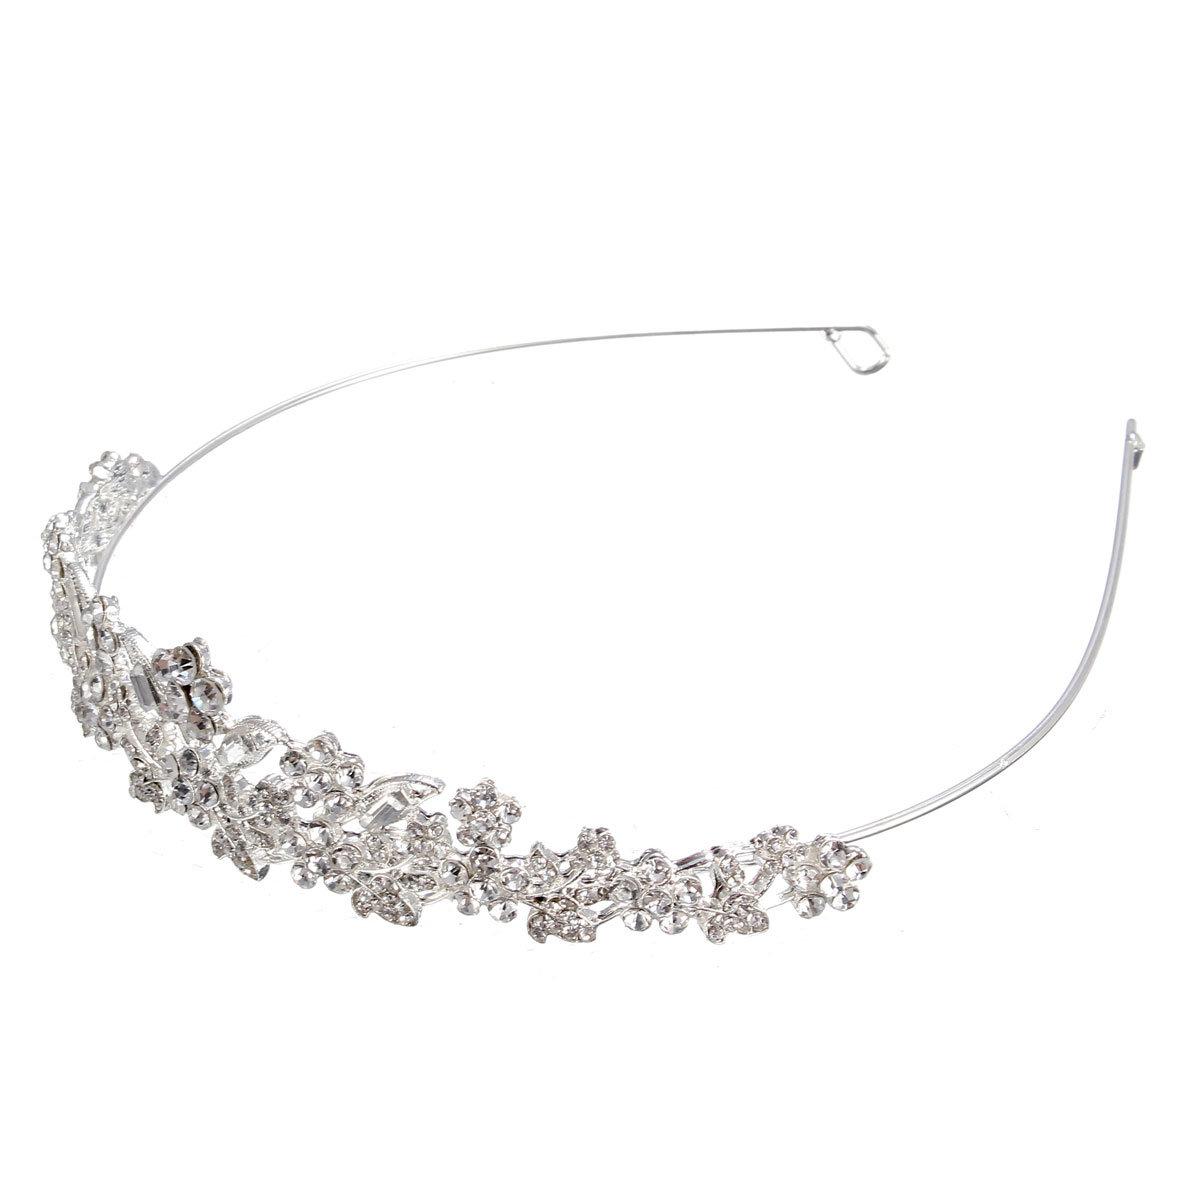 Women Bridal Hair Jewelry Crown Leaves Flower Headband Hair Accessories